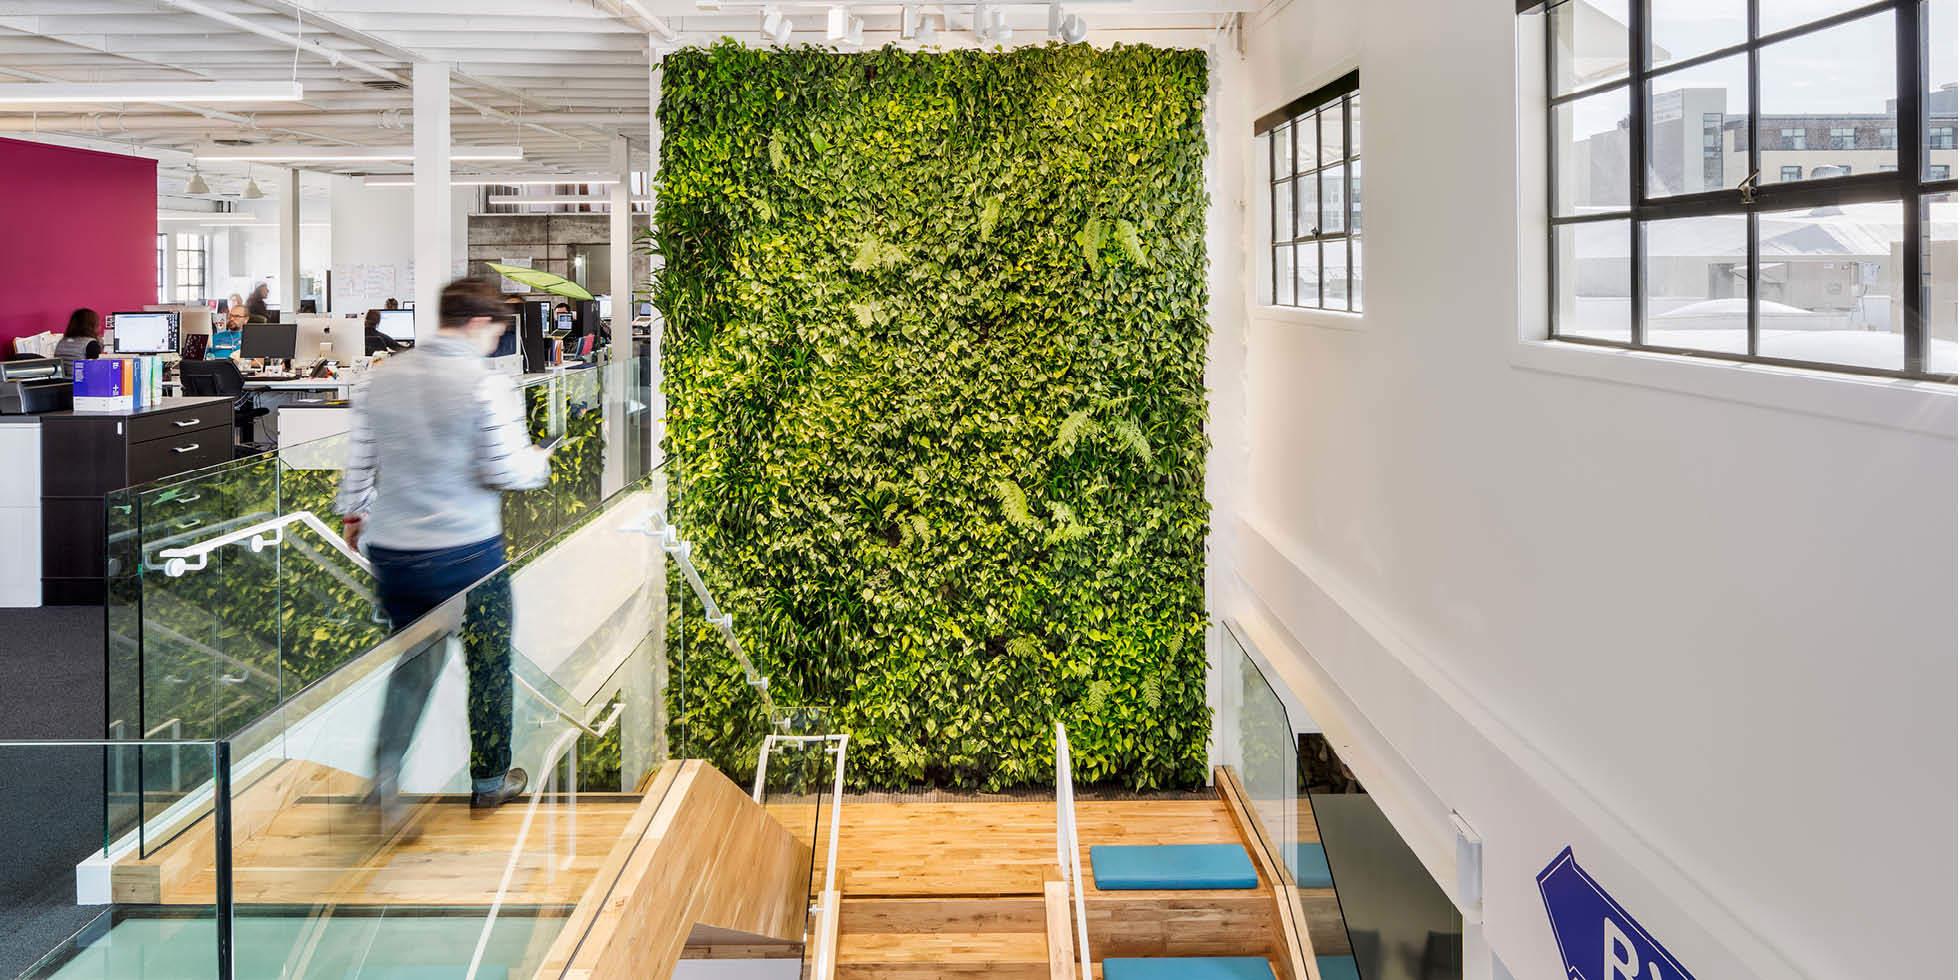 Plum Organics Living Wall by Habitat Horticulture - View 3